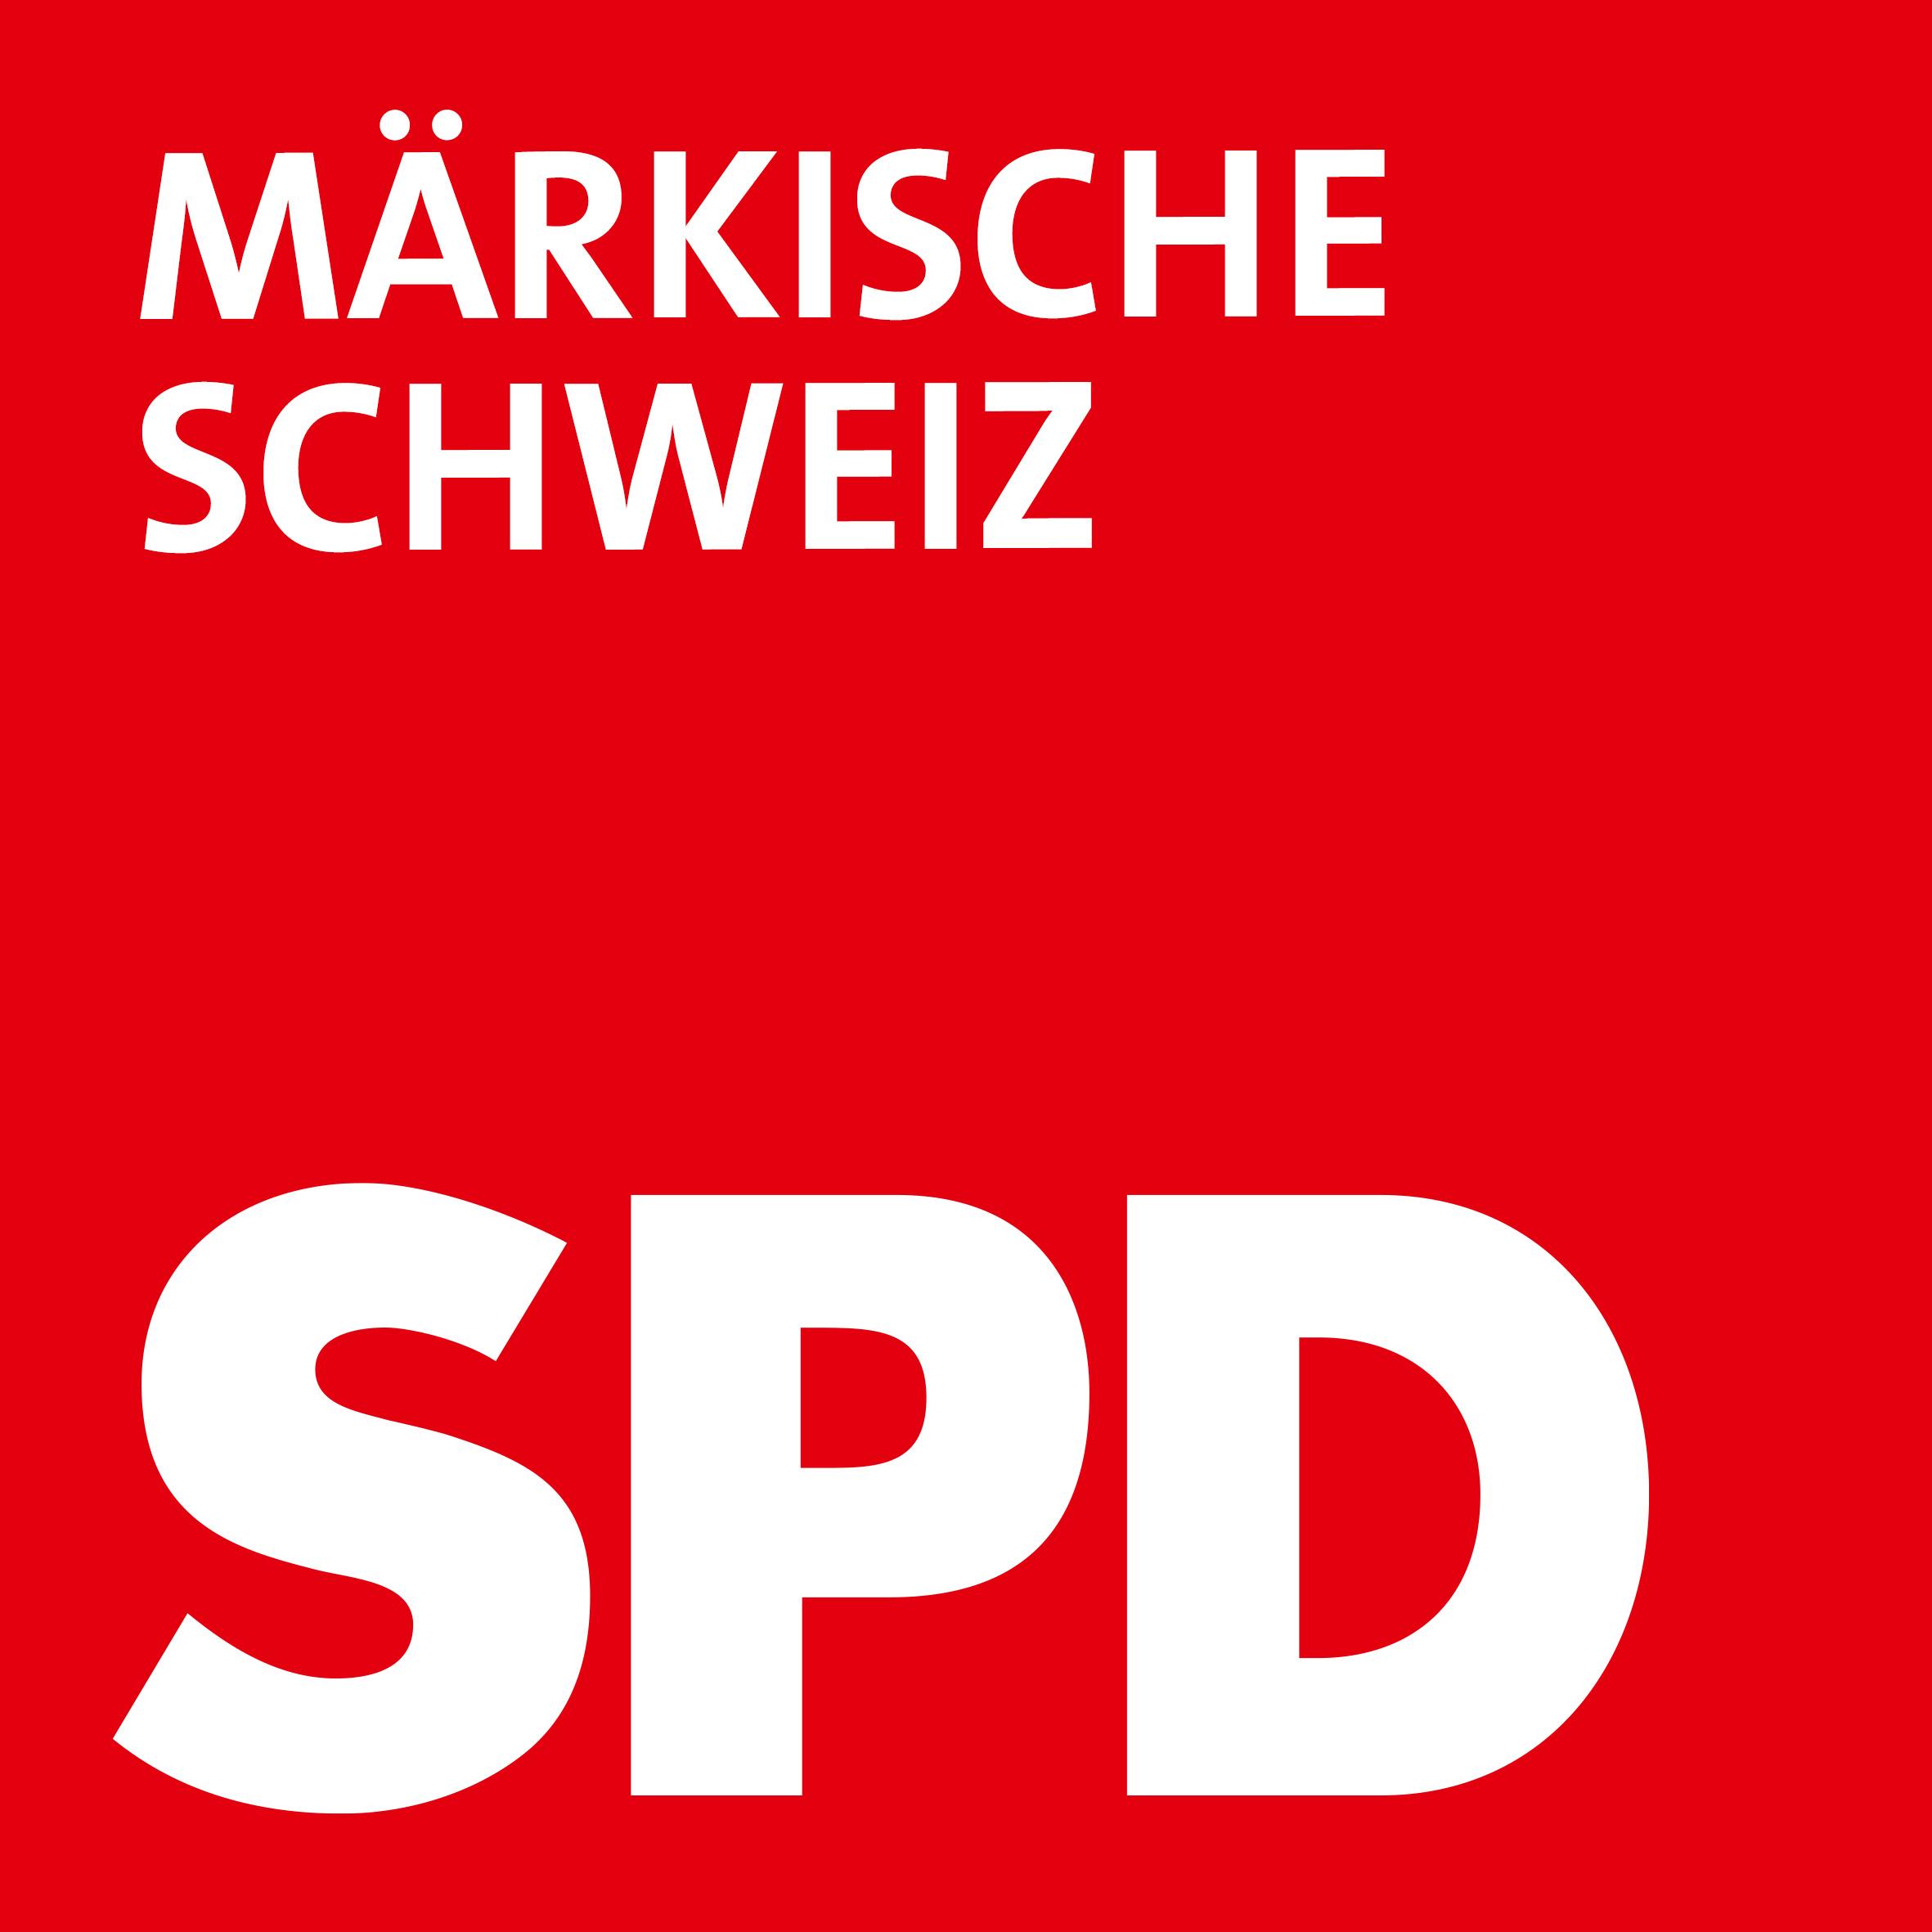 SPD Märkische Schweiz